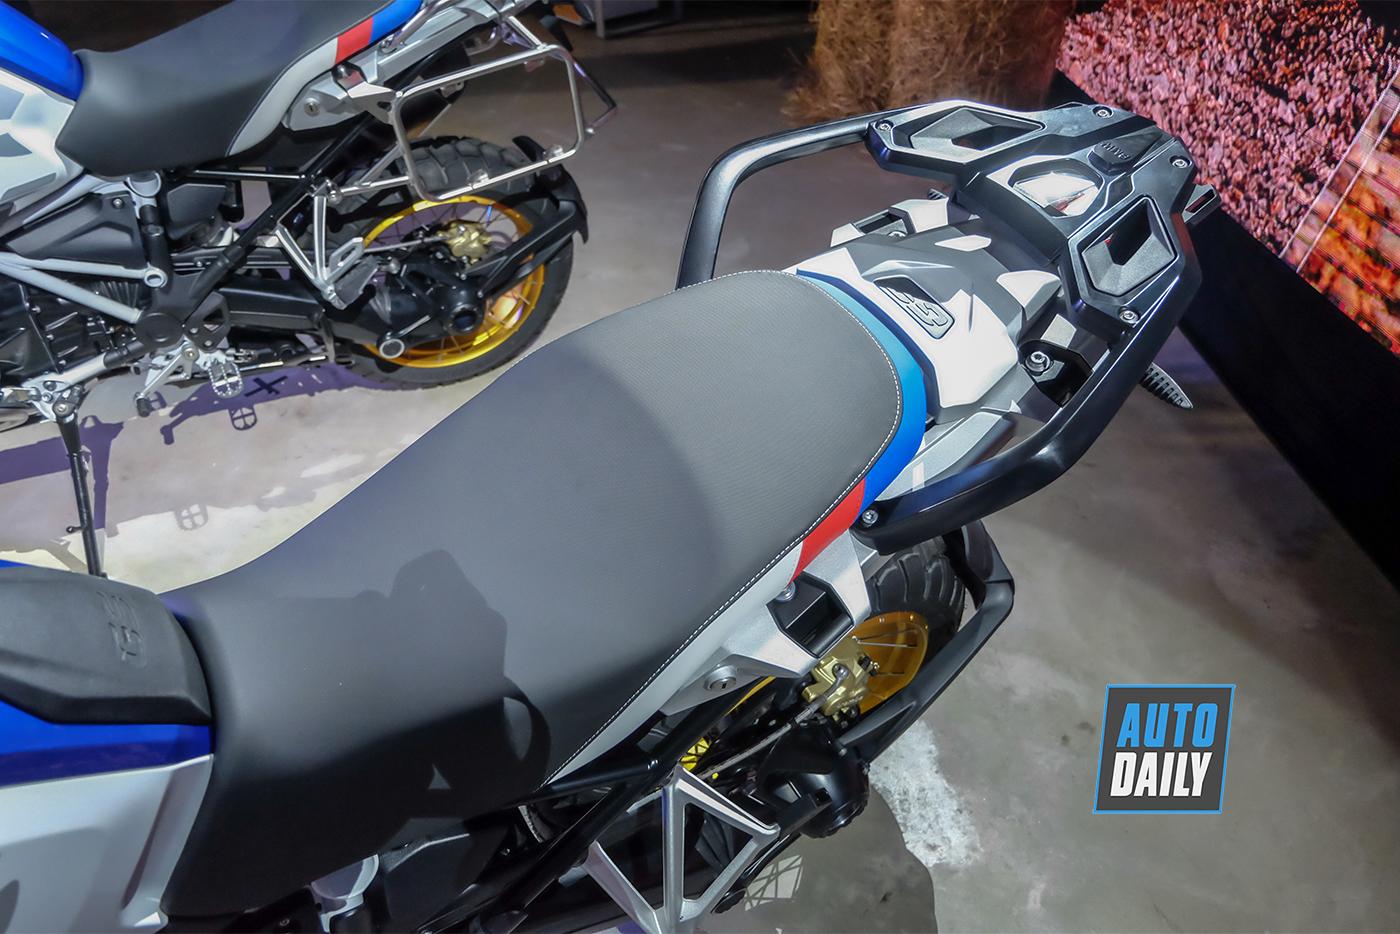 bmw-motorrad-r-1250-gs-2019-19.jpg